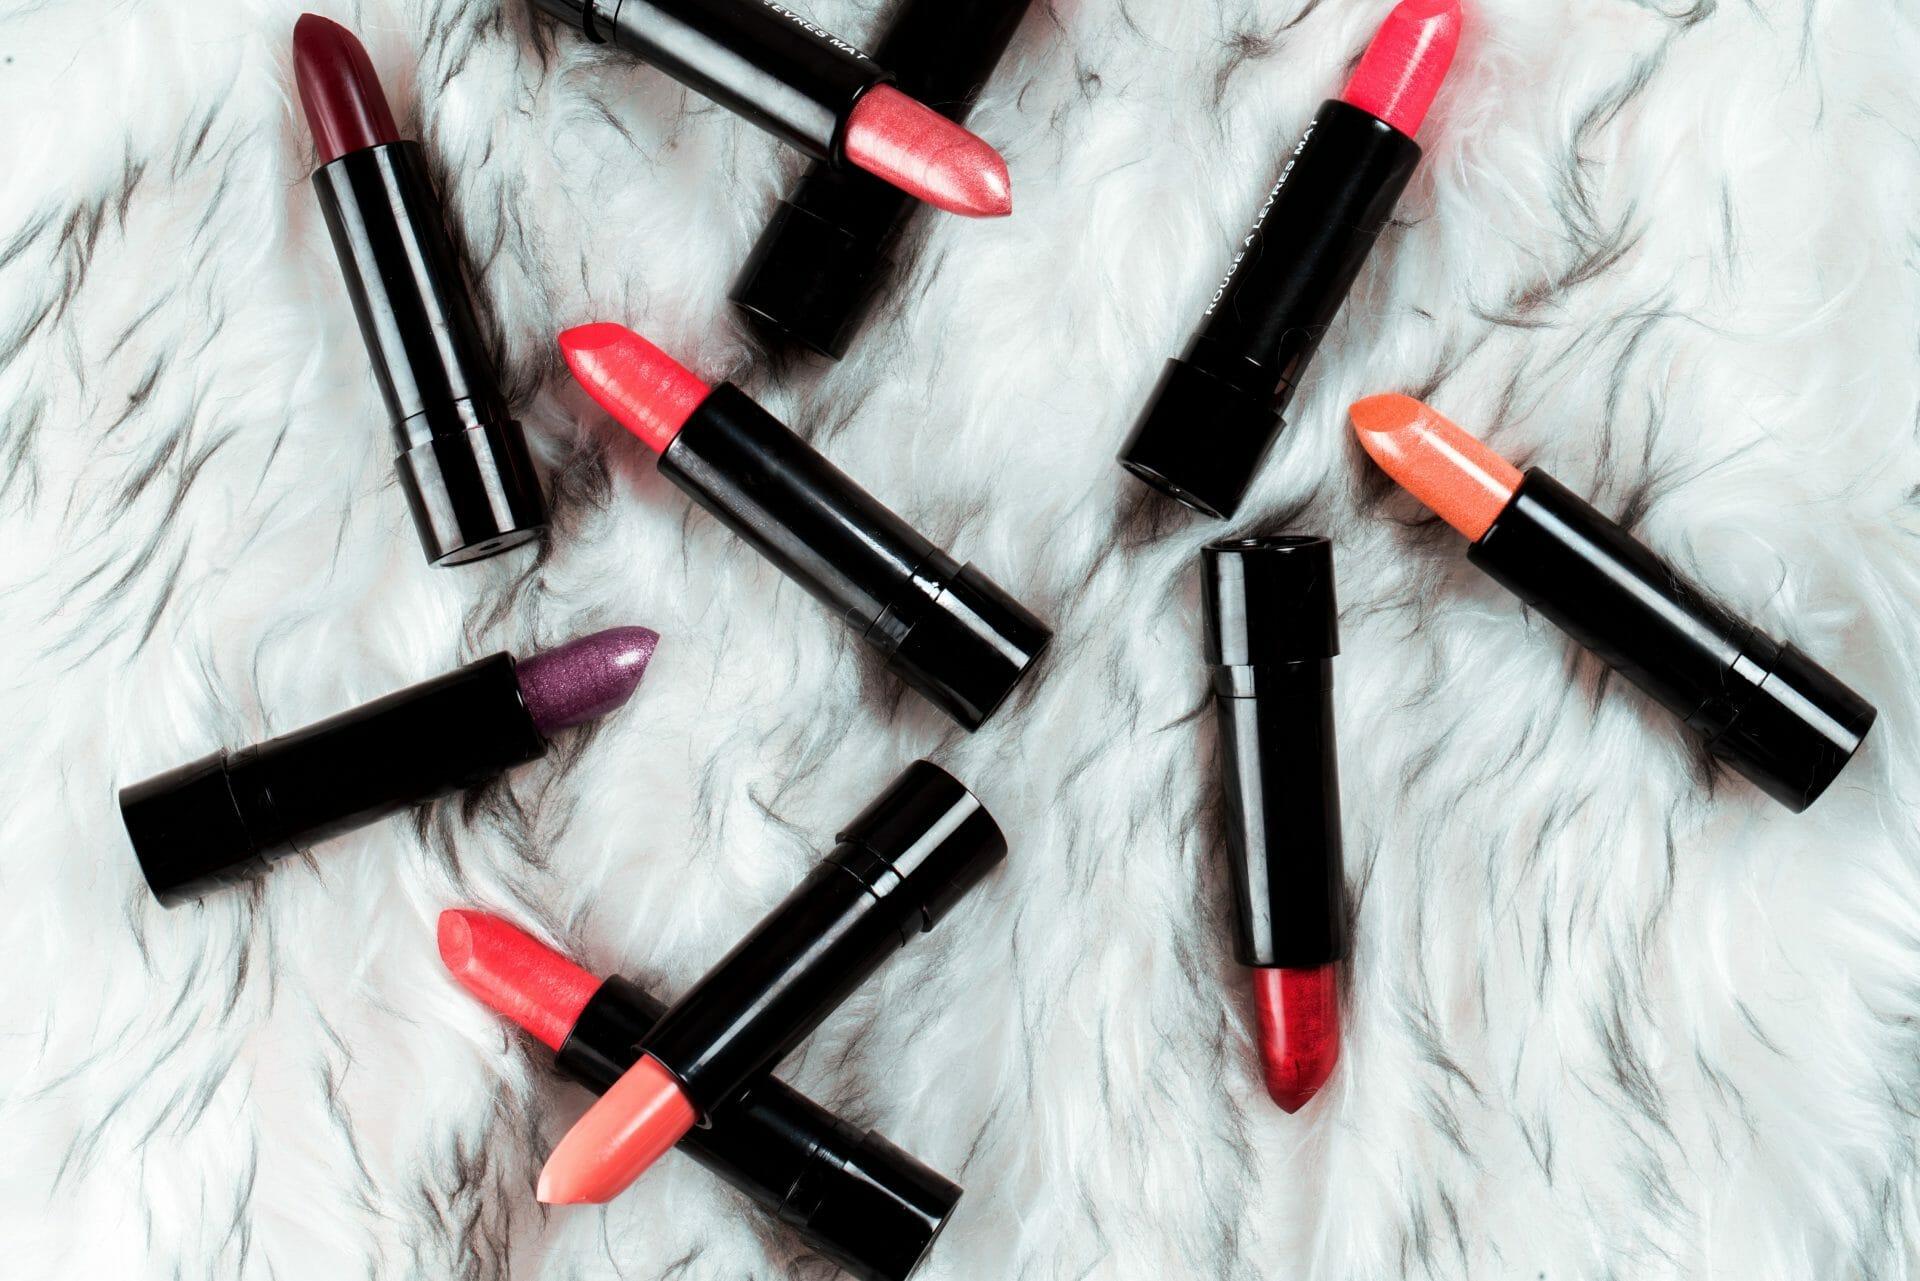 Lipstick Manufacturing